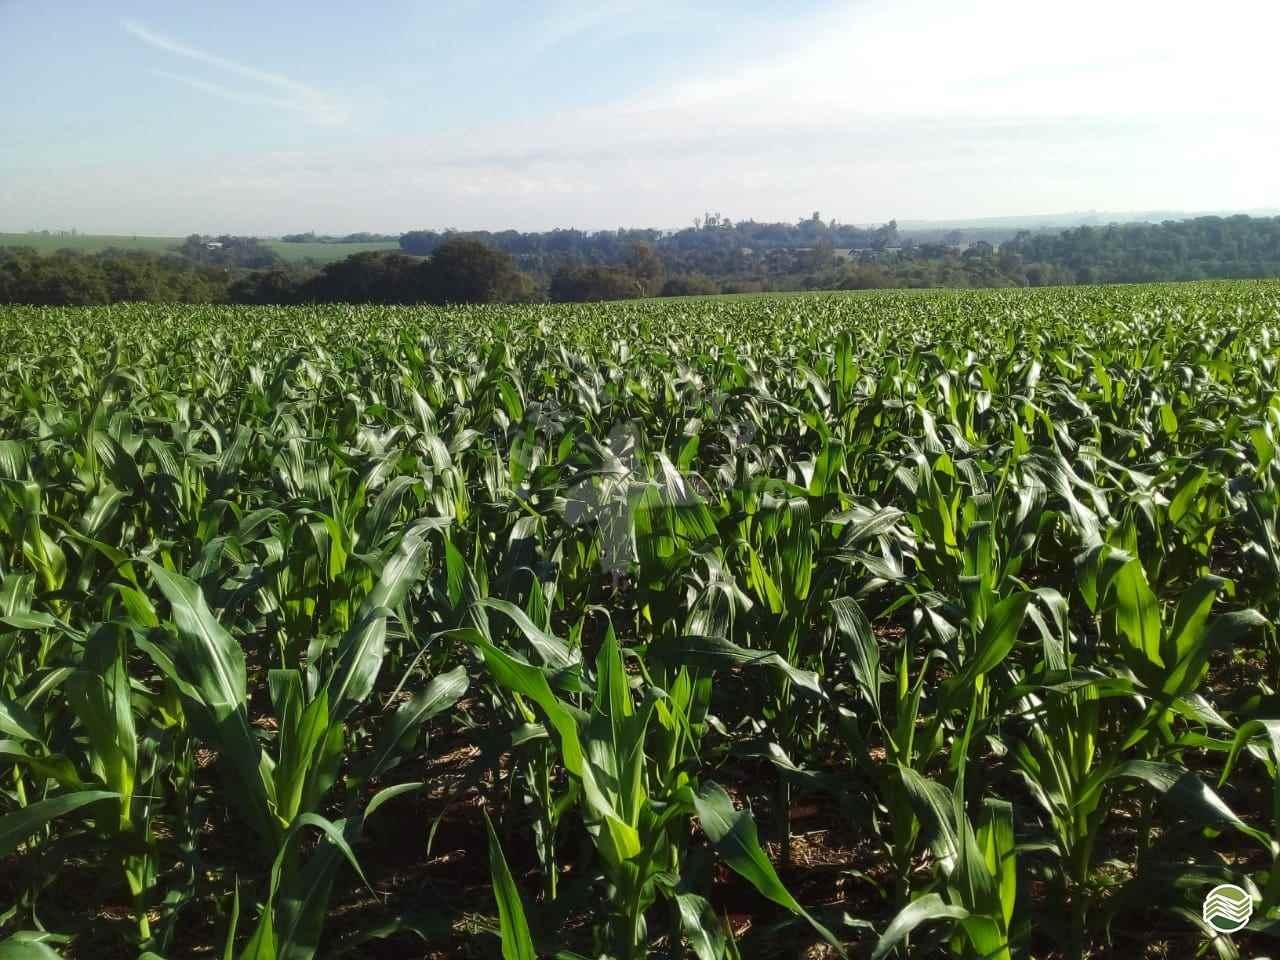 IMÓVEIS SITIOS  20 Terra Mais Implementos Agrícolas